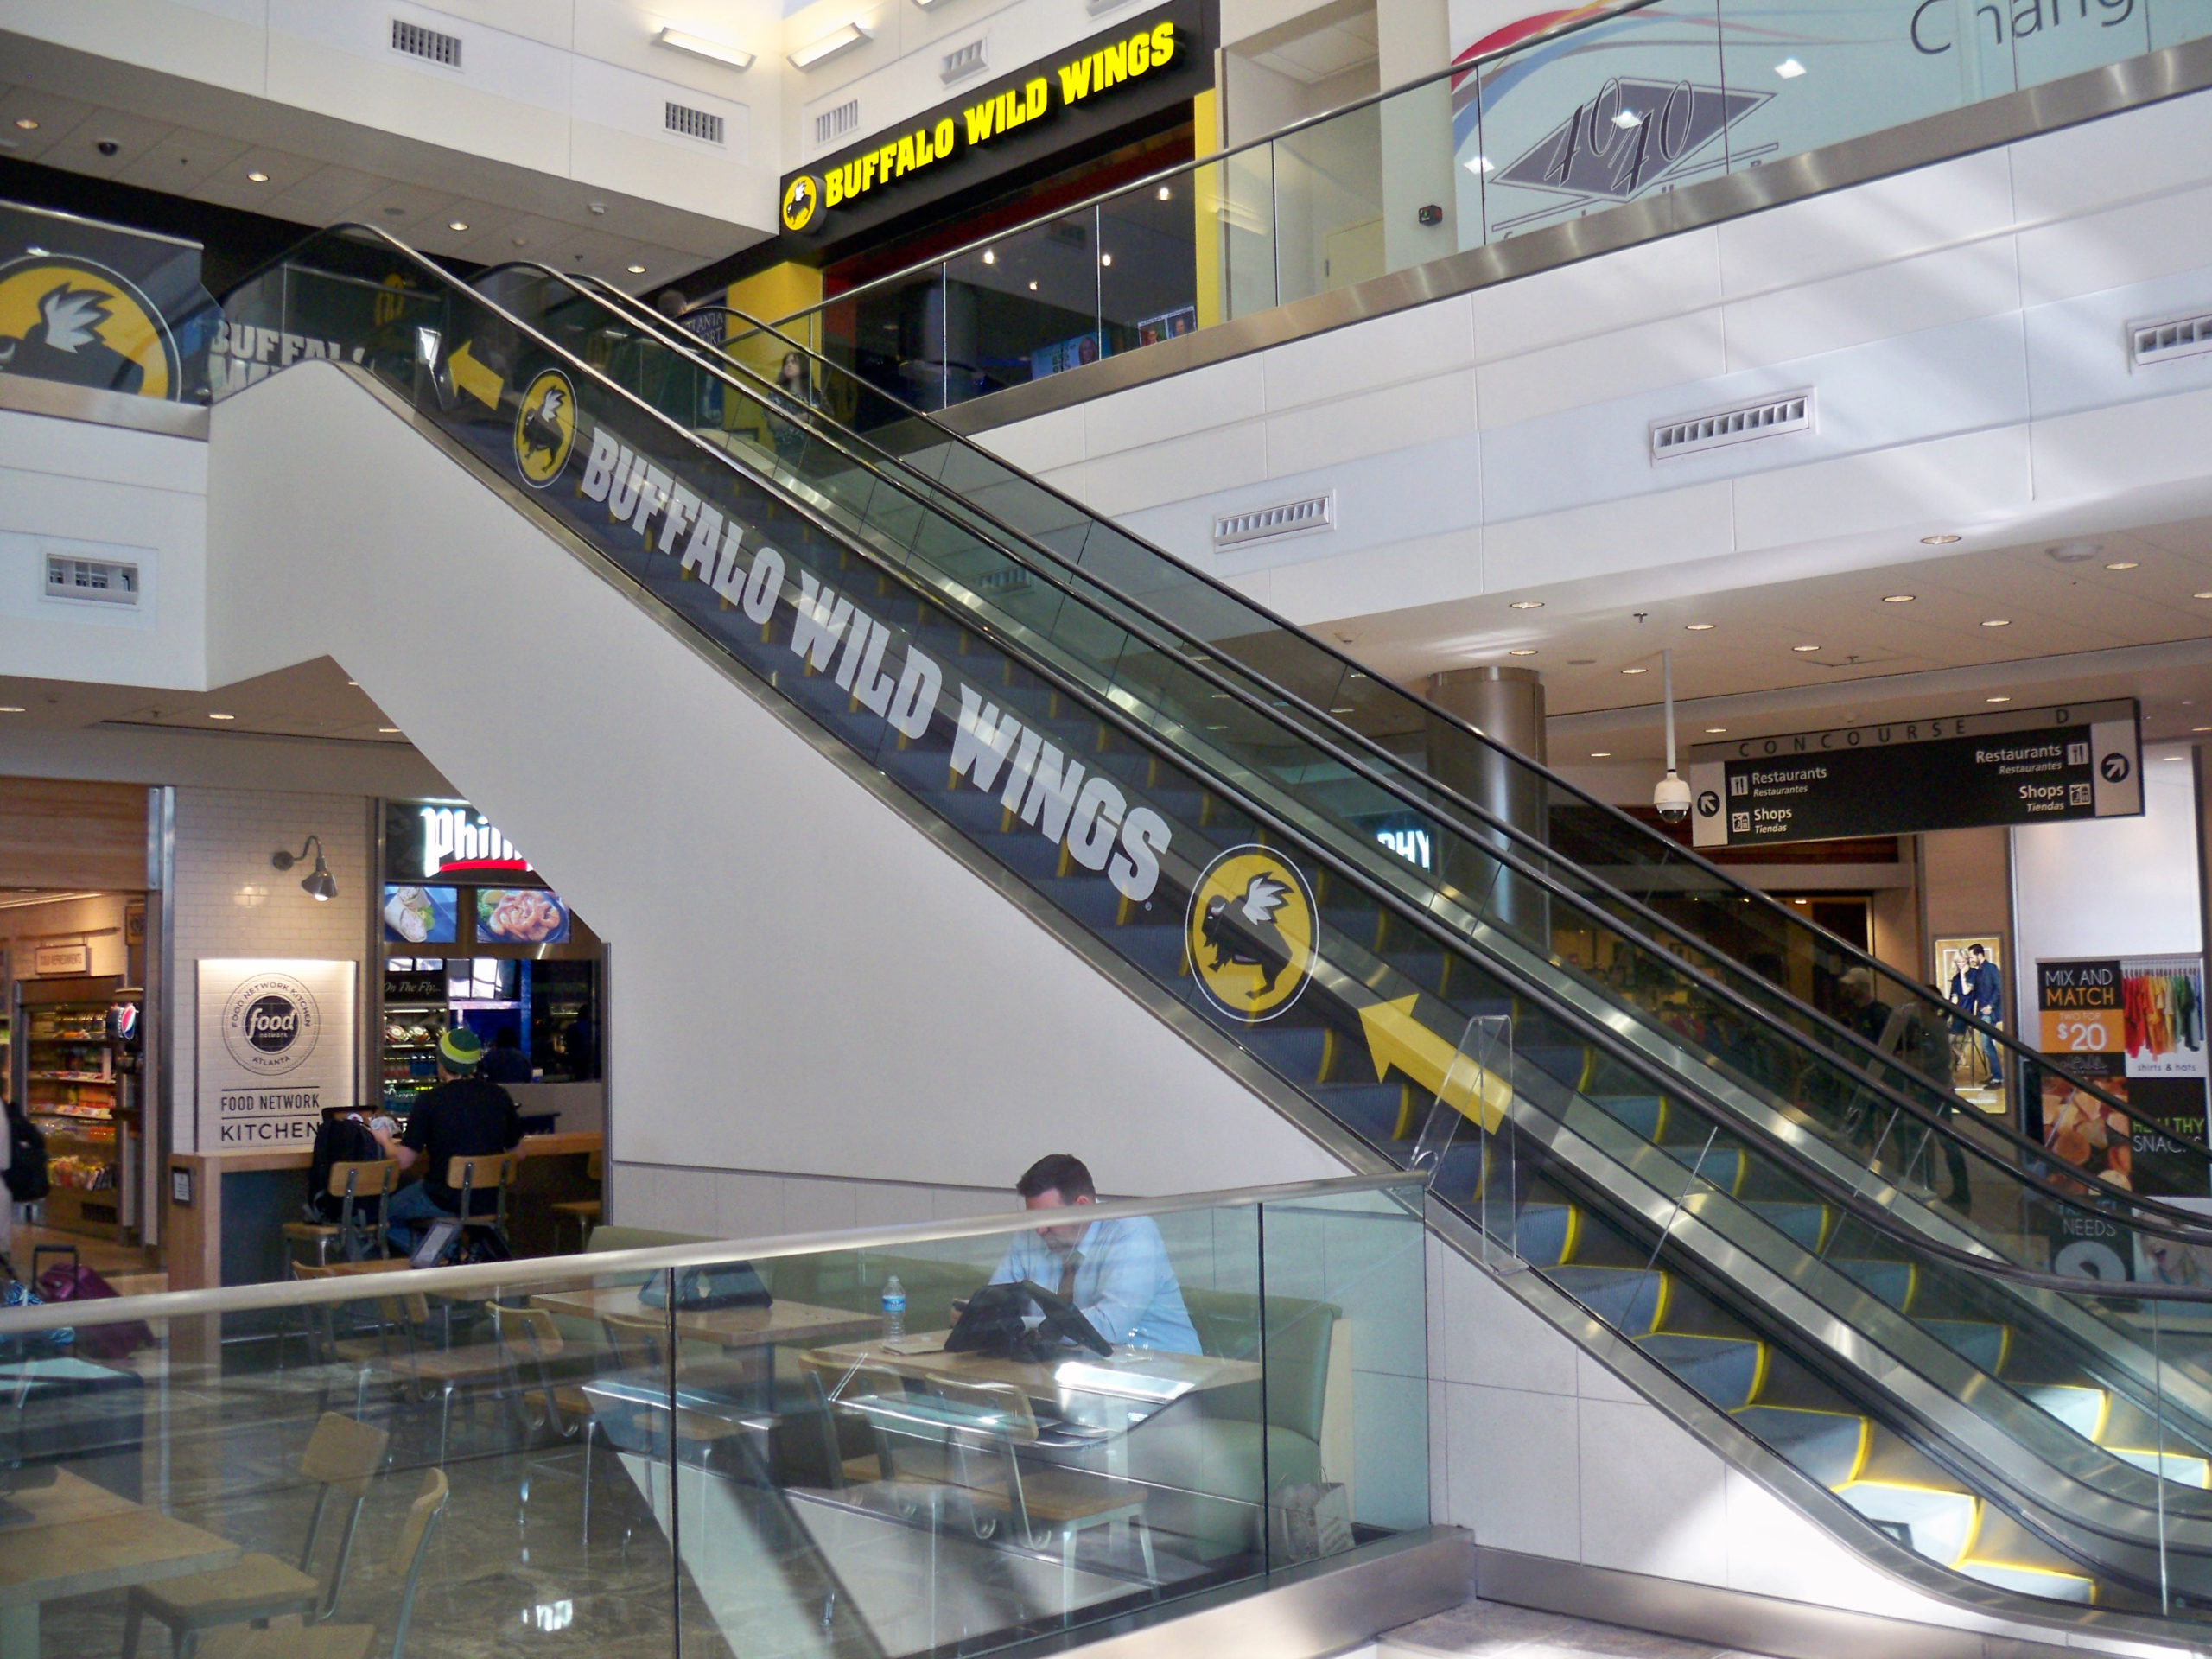 buffalo-wild-wings-escalator-contra-vision-window-advertising